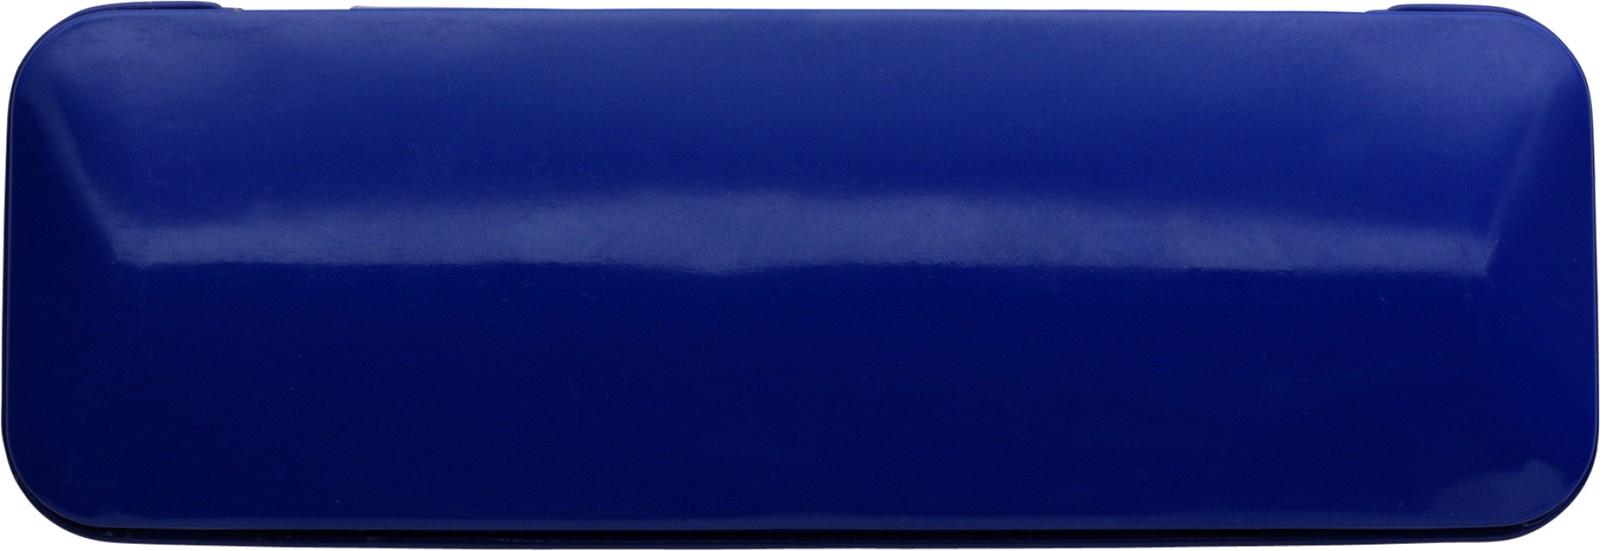 Aluminium writing set - Cobalt Blue